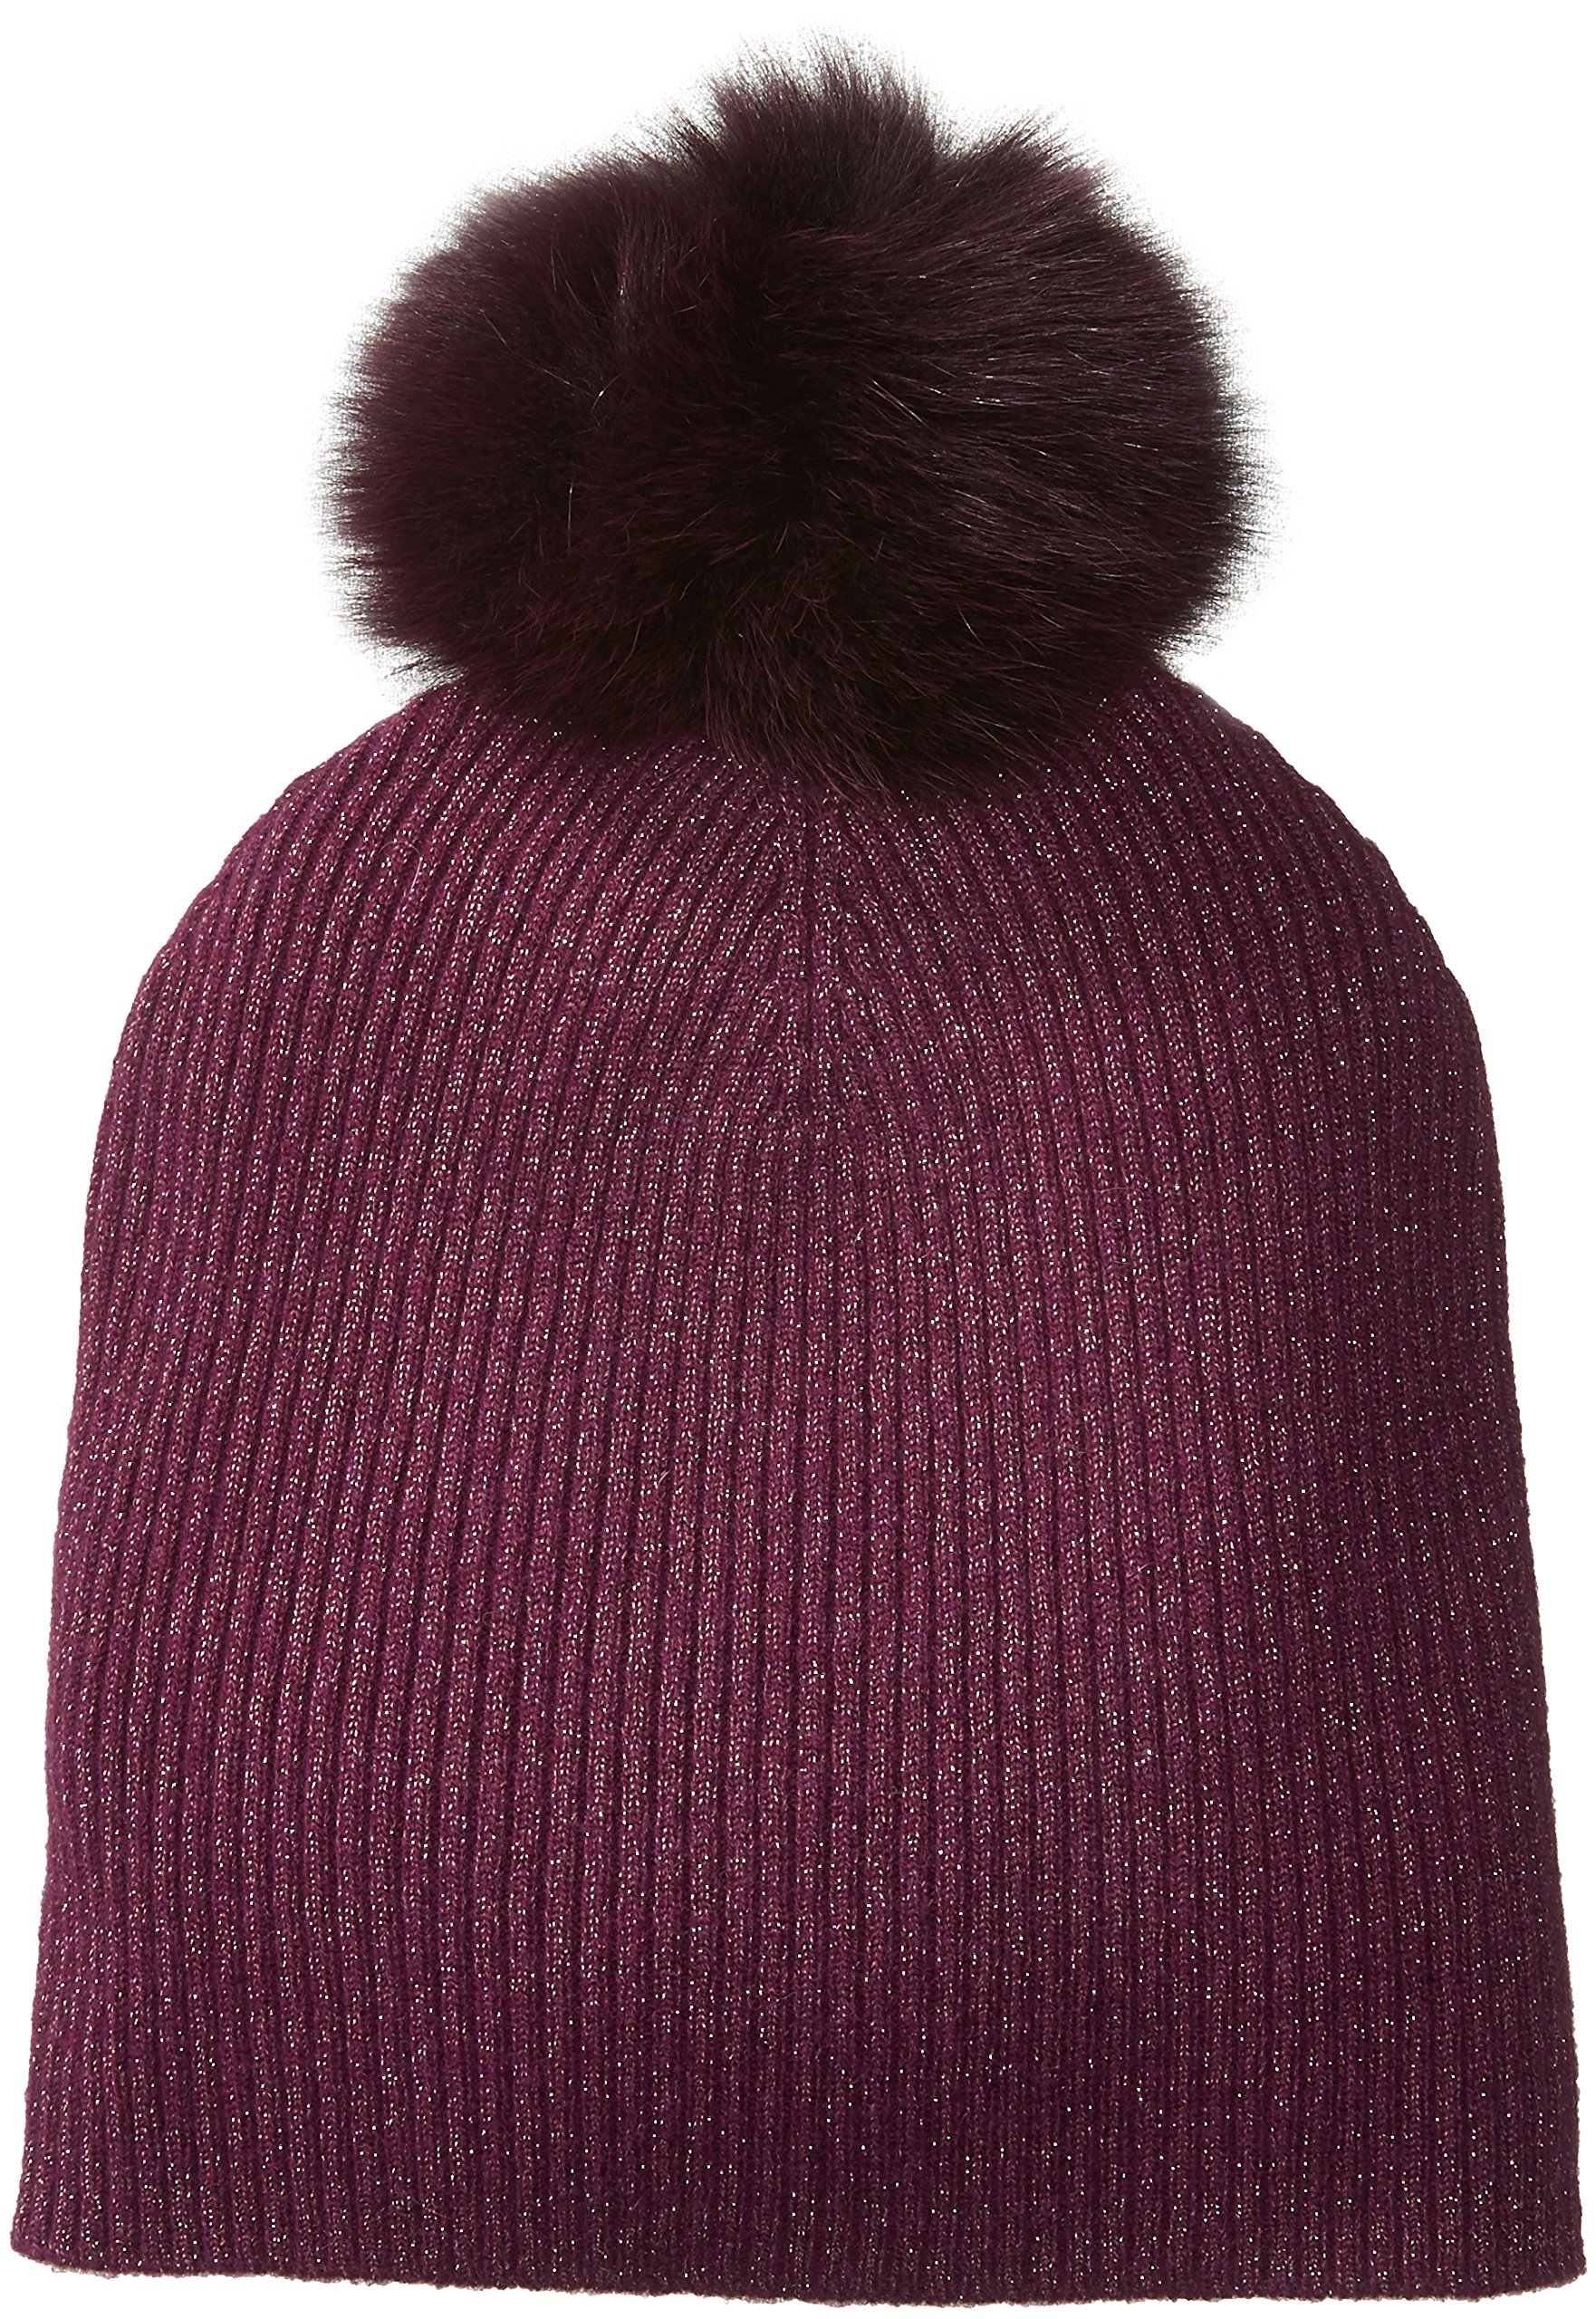 Sofia Cashmere Women's Cashmere Fur Pom Hat-Slouchy, Magic Berry + Gold Lurex/Plum, One by Sofia Cashmere